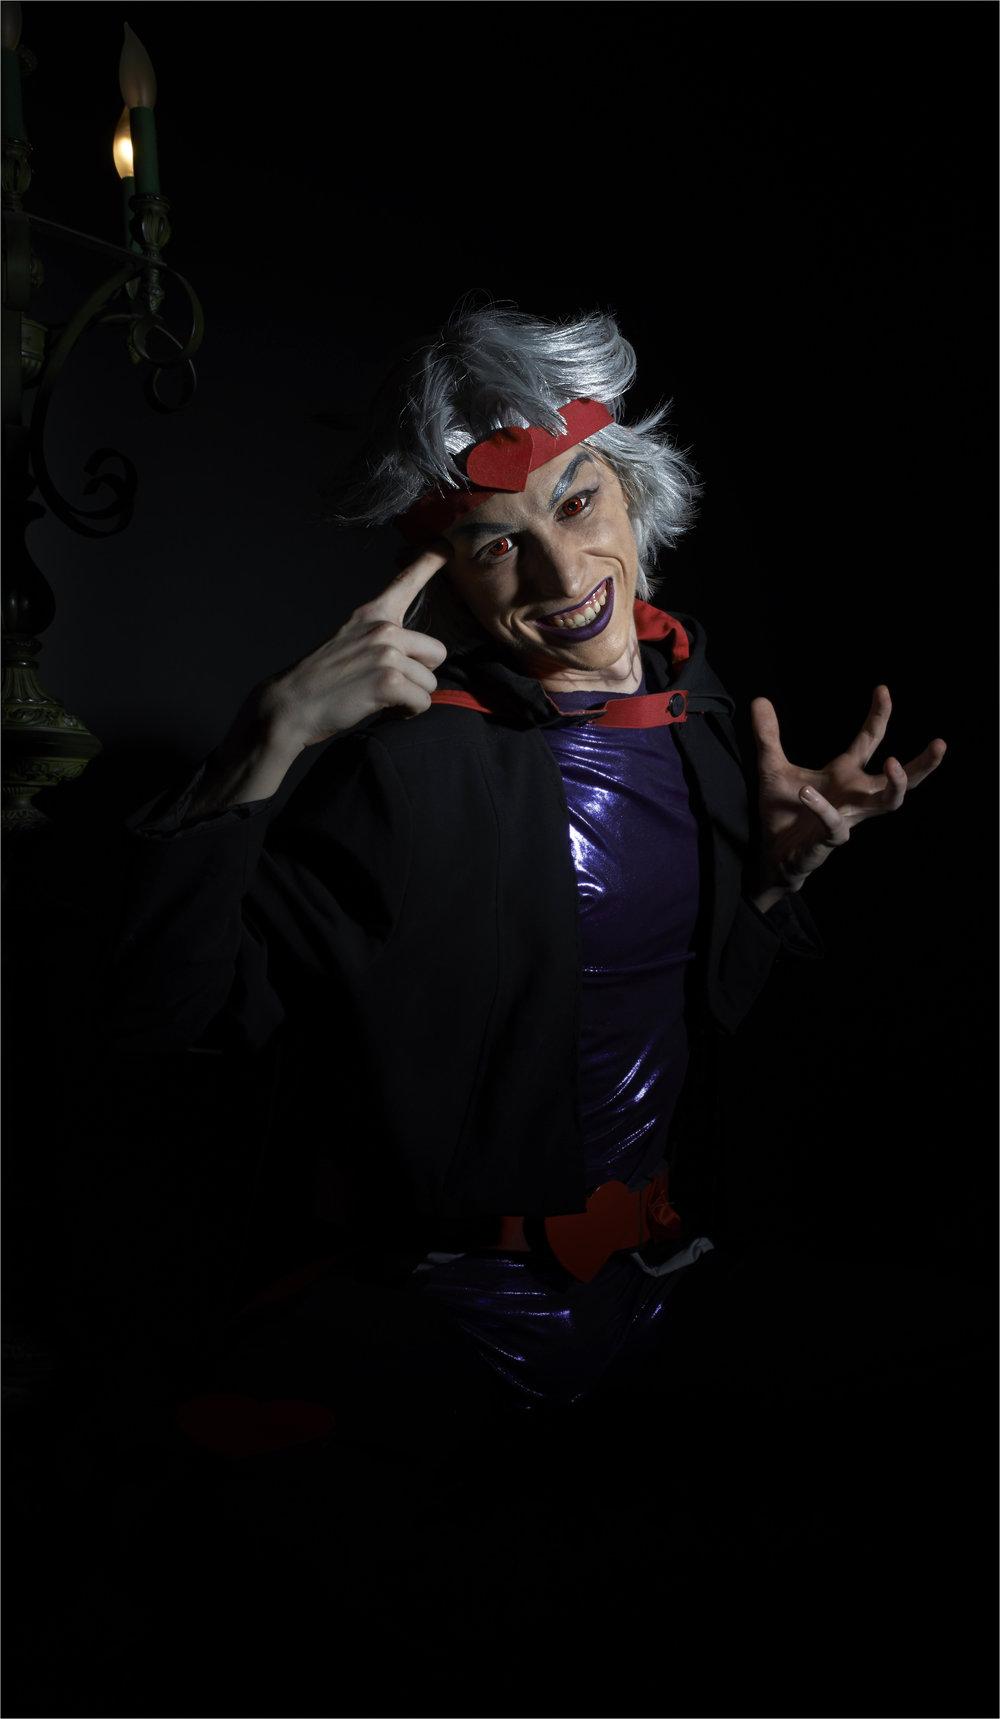 A friend modeling his cosplay of Dio Brando from JoJo's Bizarre Adventure.